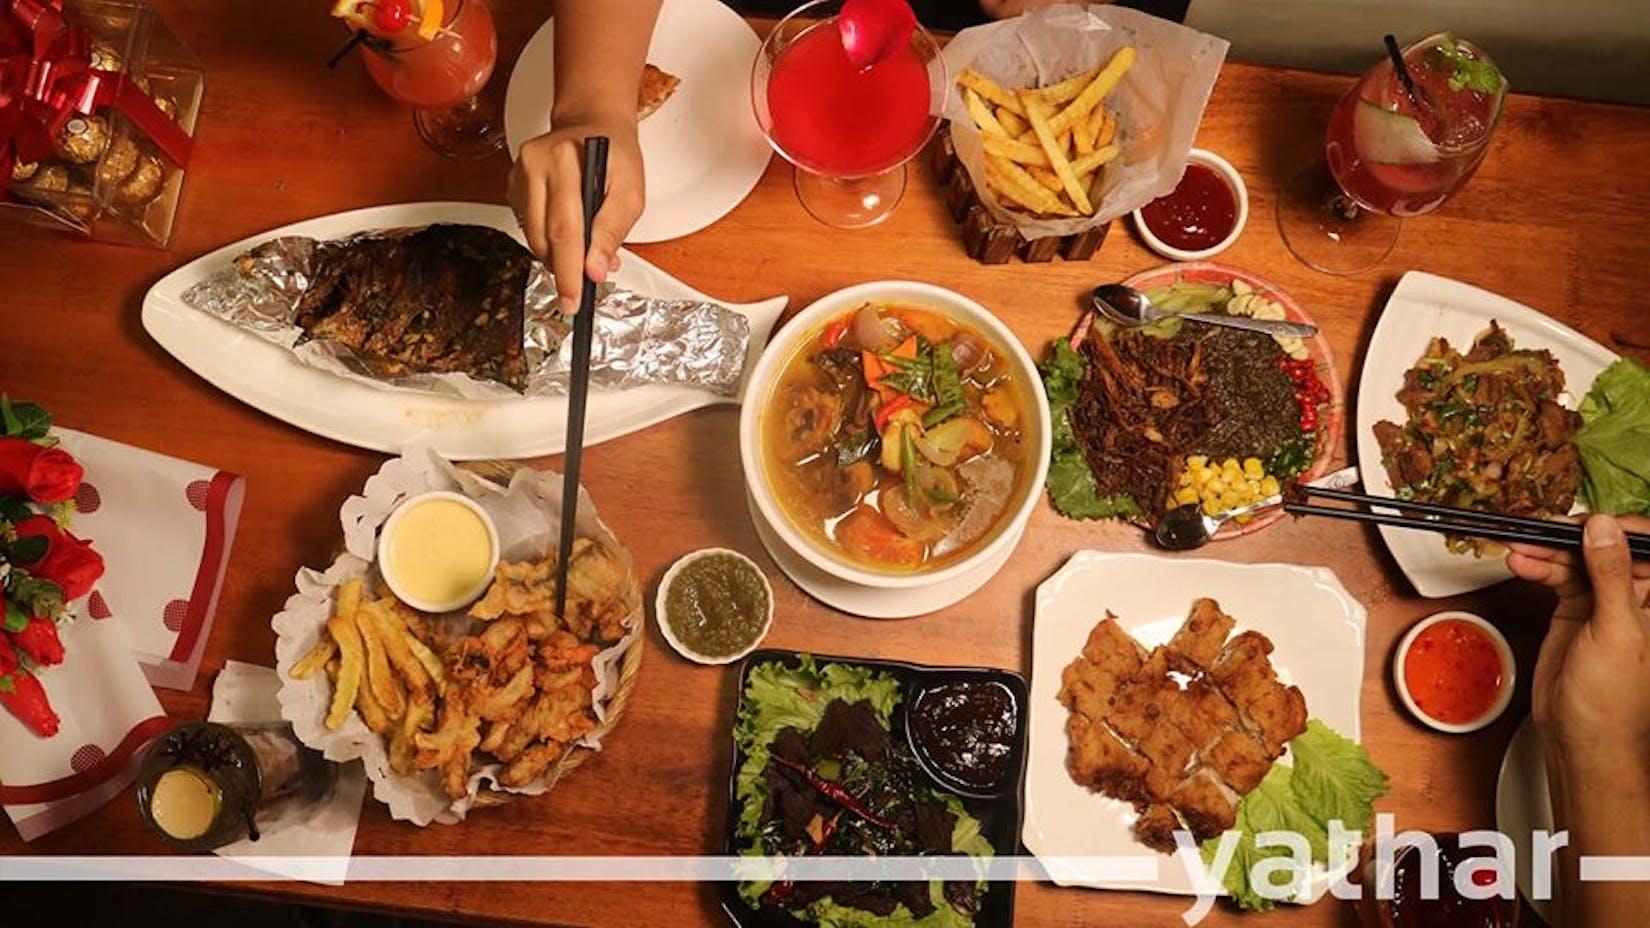 Conifer 46 Bar & Restaurant | yathar